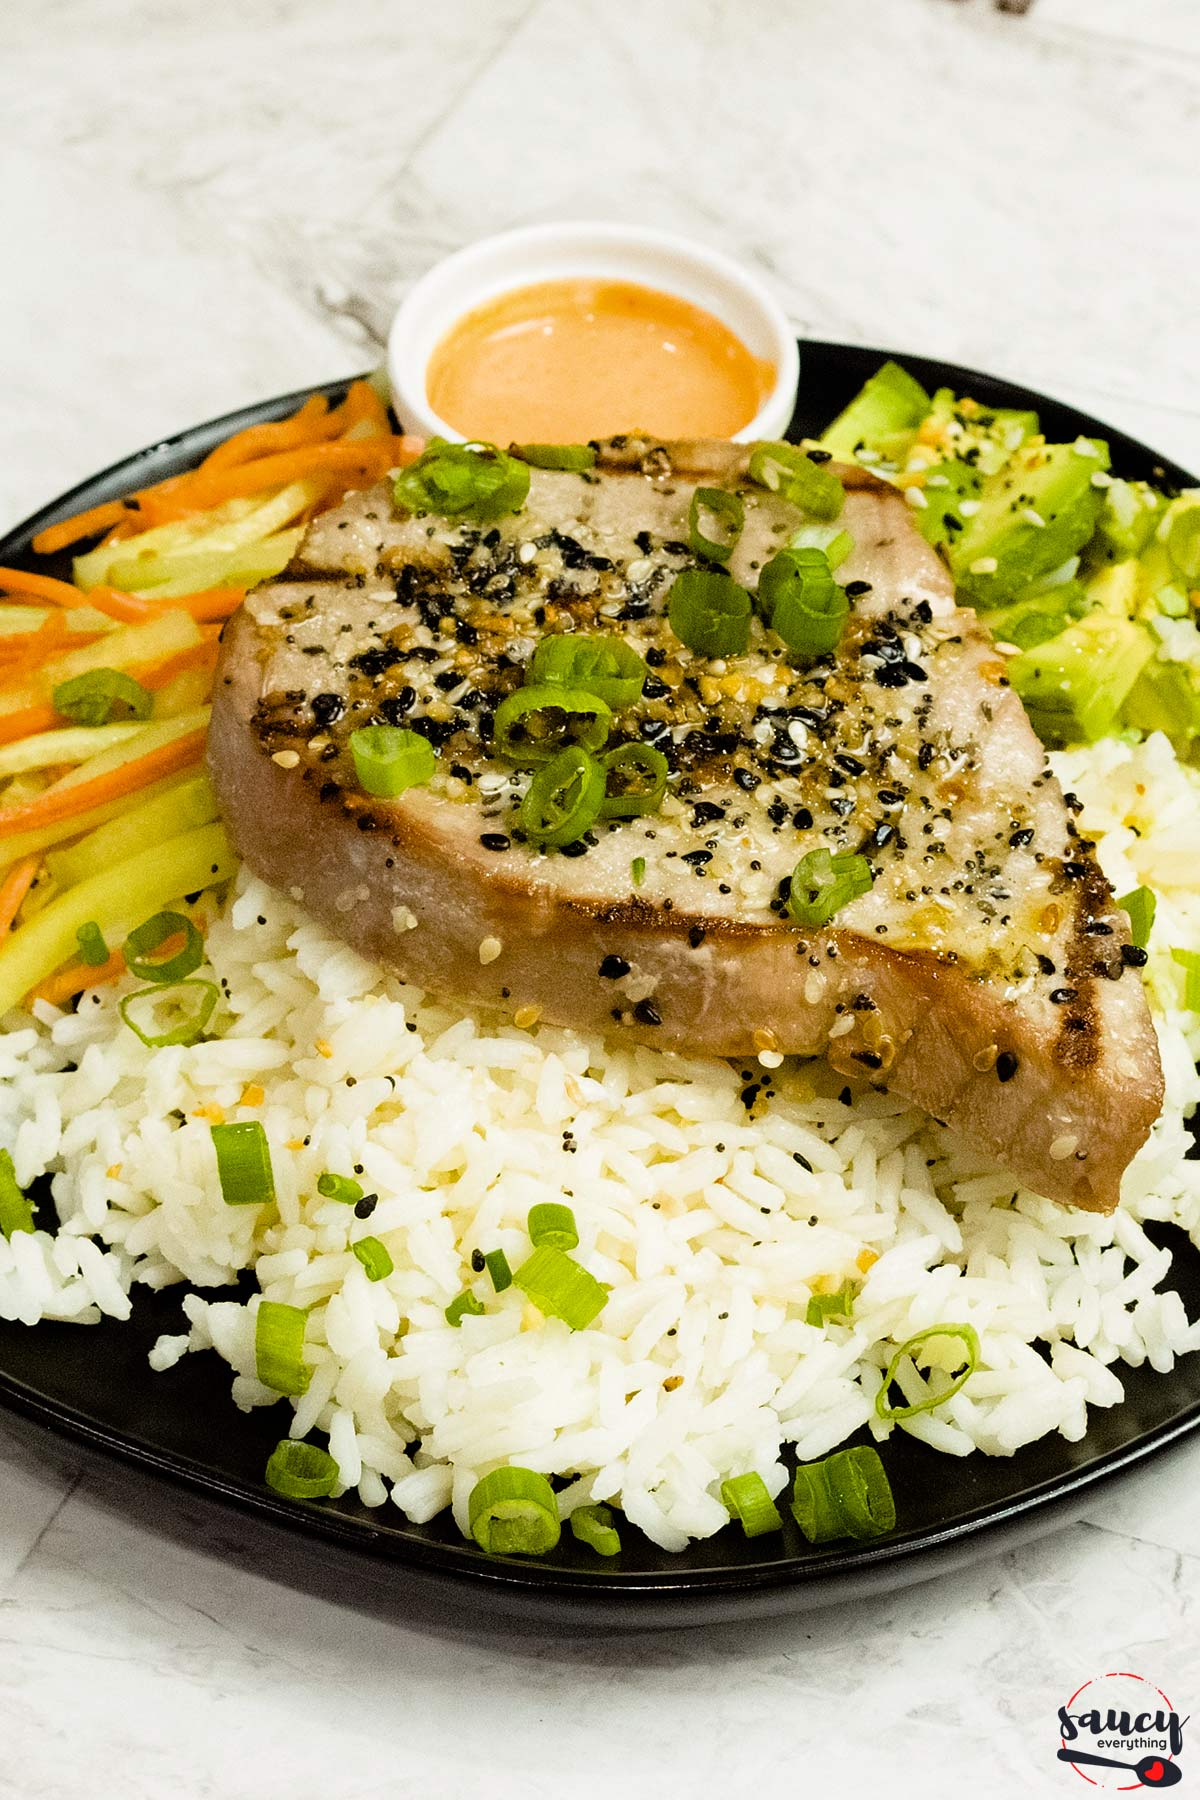 grilled tuna steak served with spicy sriracha mayo